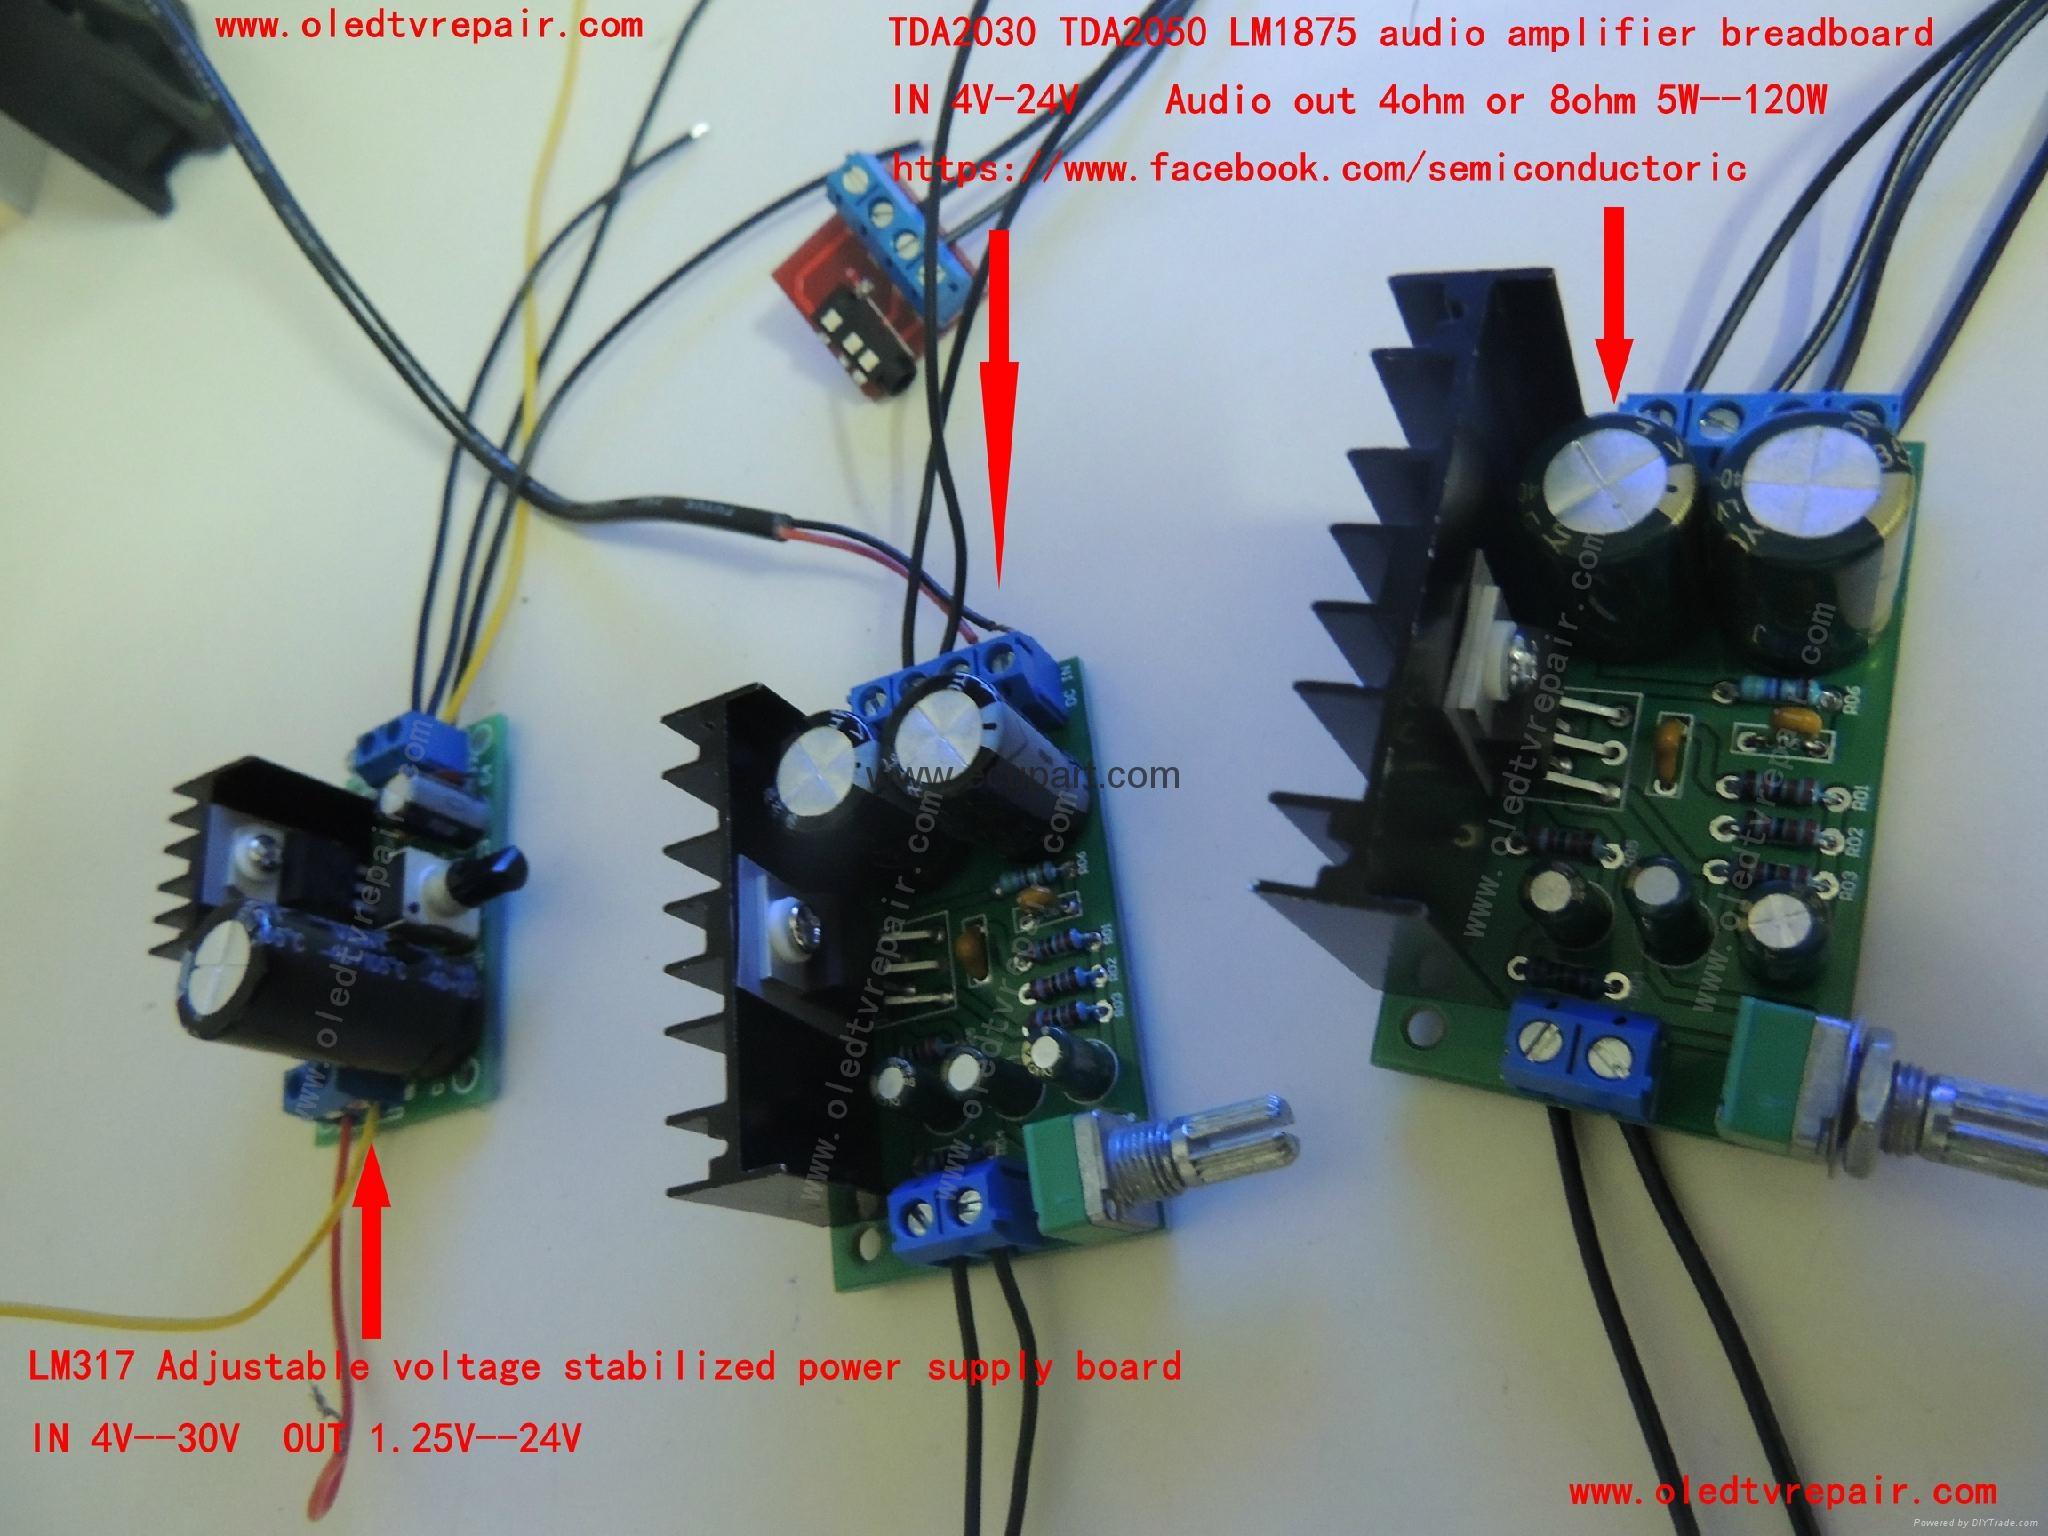 TDA2030 TDA2050 LM1875 AUDIO POWER Amplifier  Amplificatore